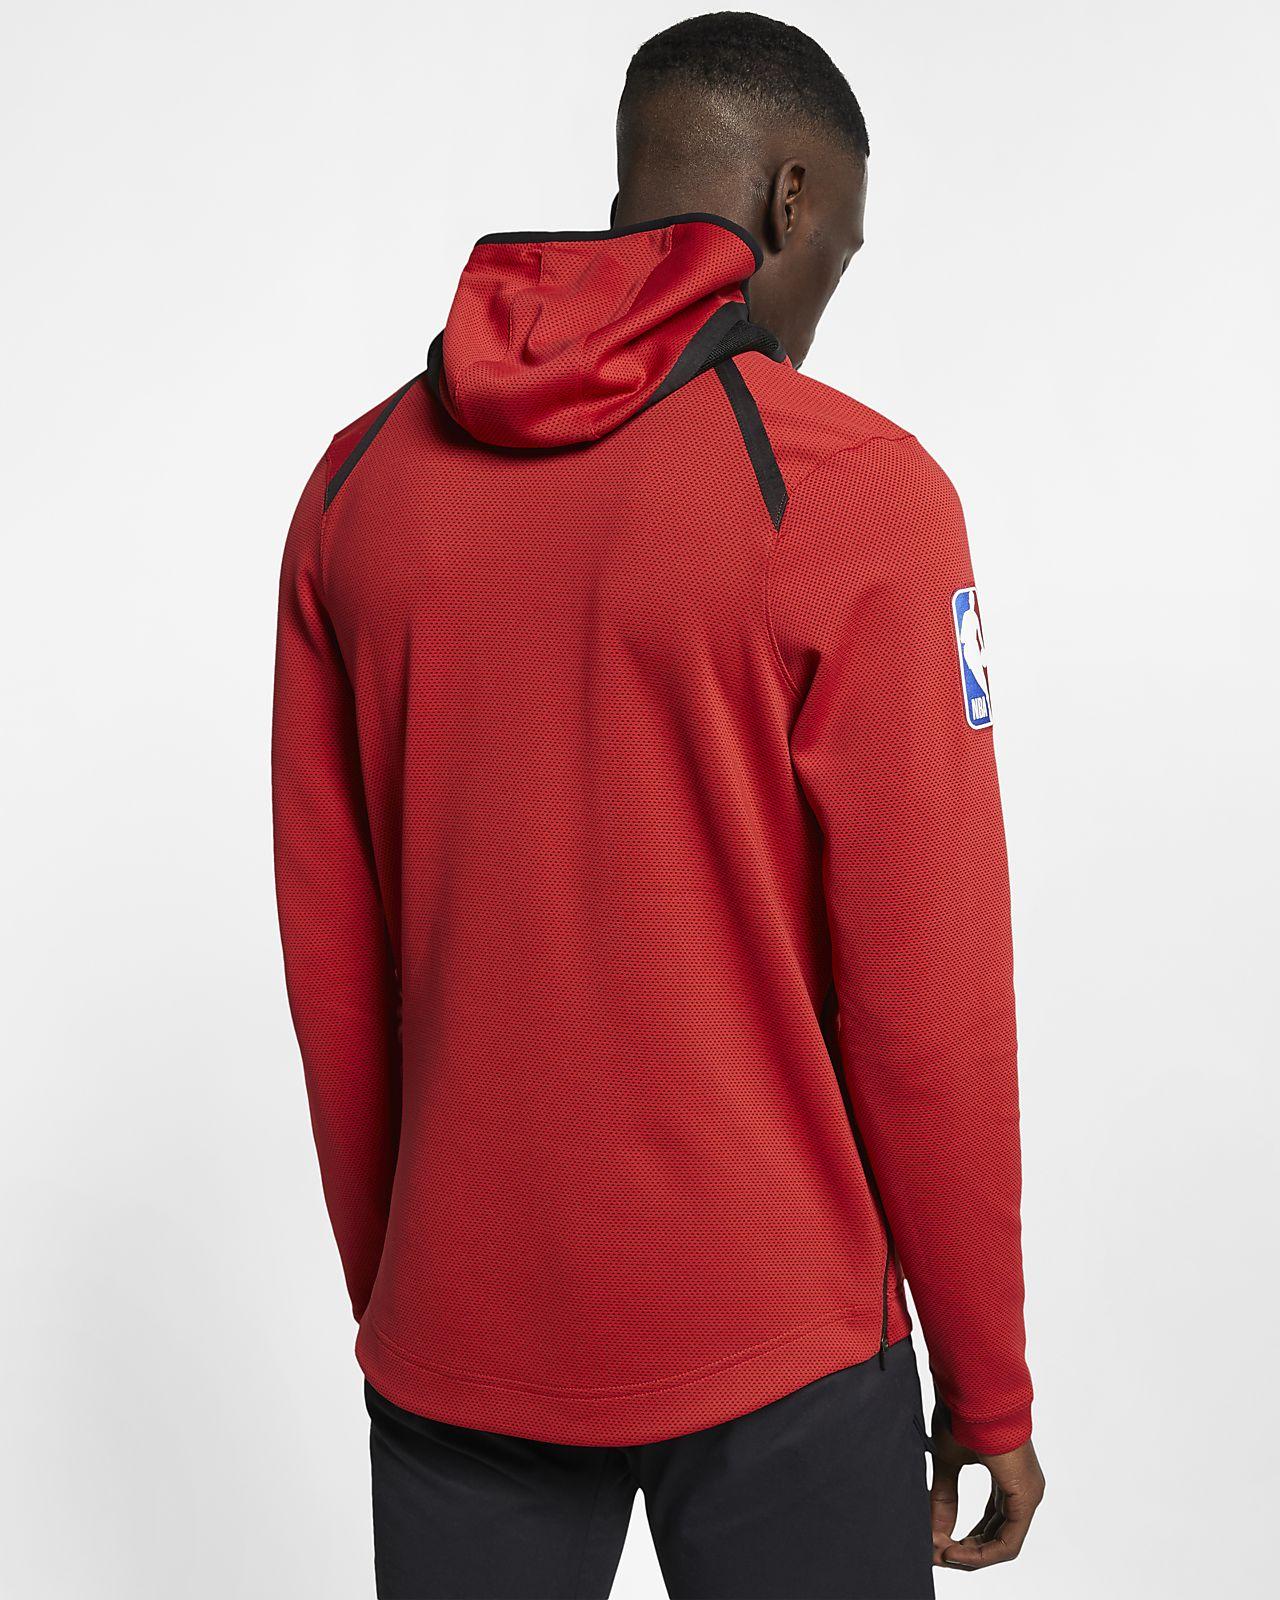 e5297bdc4300 Chicago Bulls Nike Therma Flex Showtime Men s NBA Hoodie. Nike.com